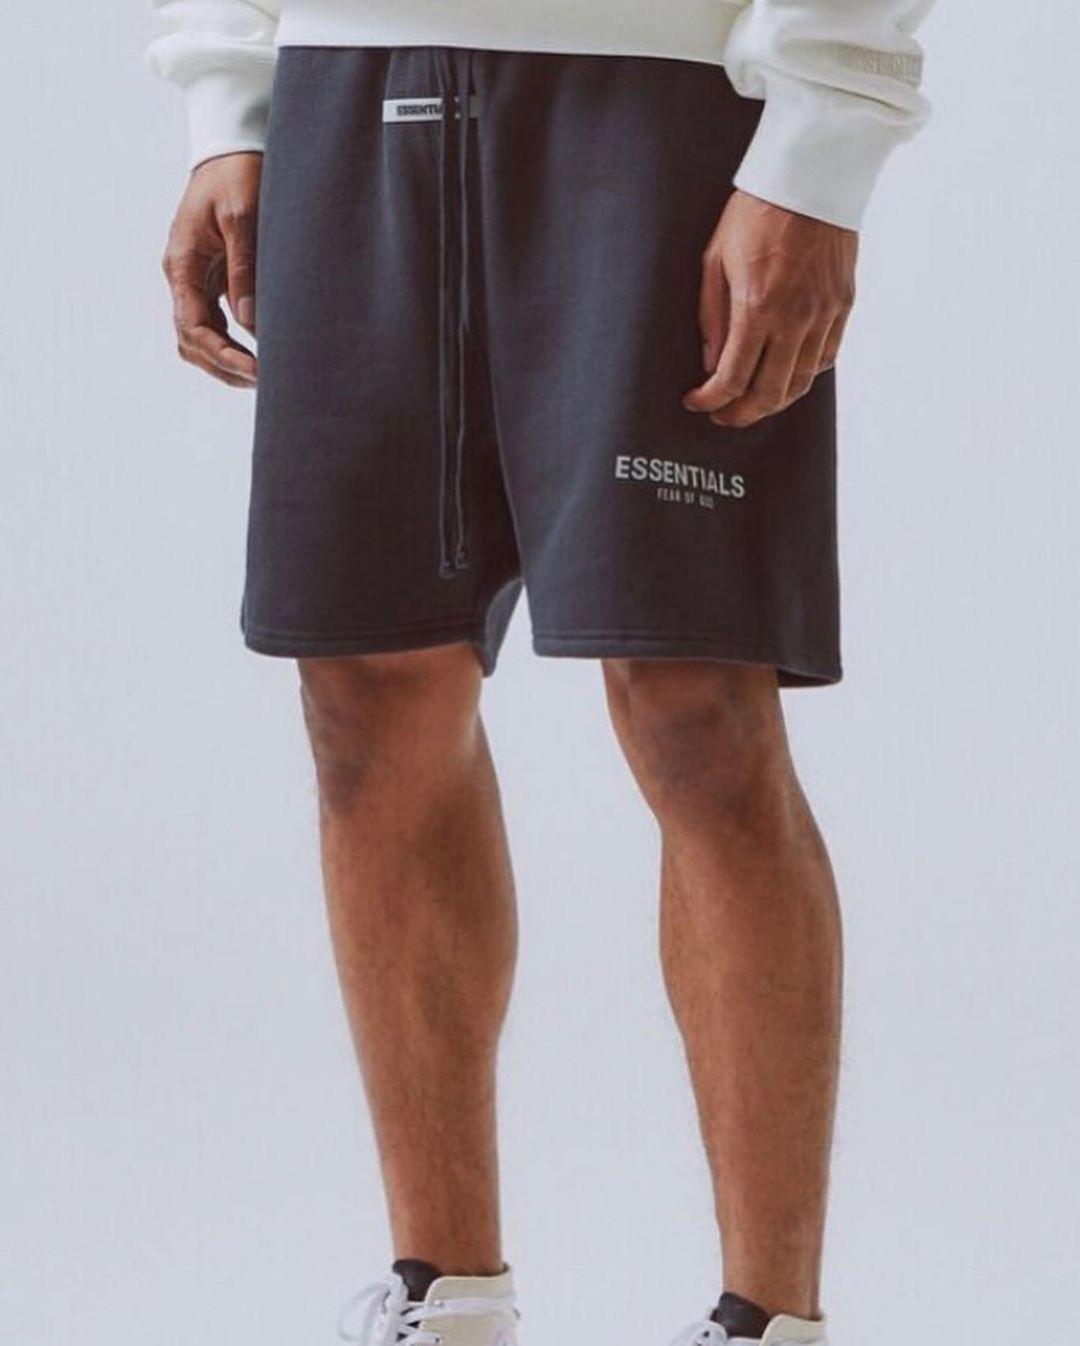 Fashion Shorts FEAR OF GOD ESSENTIALS Spiegelung Stickerei Sommer Outdoor-Sport-Laufhose FOG Fünf Farbe